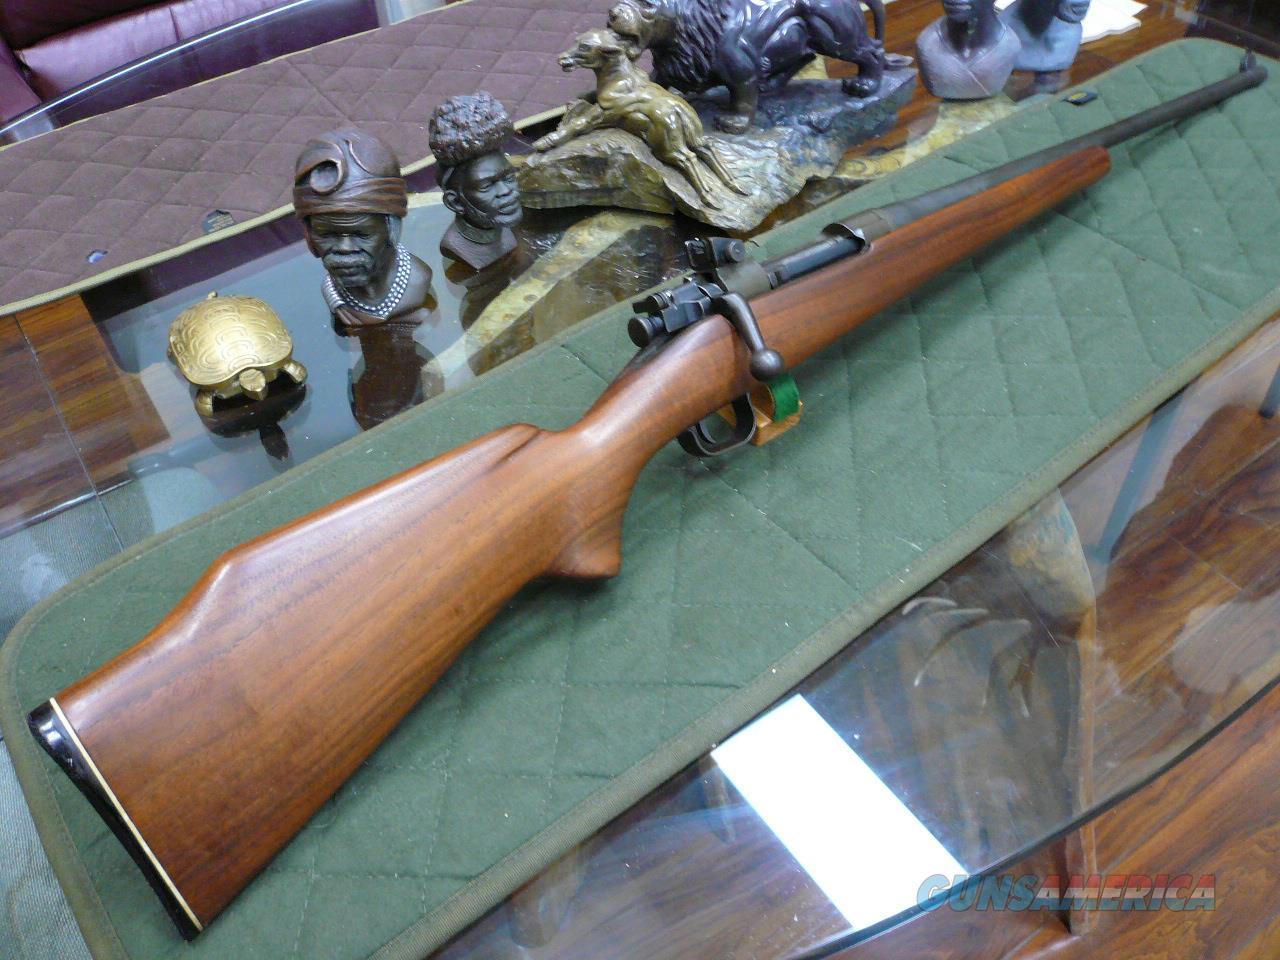 U.S.REMINGTON 03-A3 (1943 vintage) 30-06 cal,CUSTOM SPORTERIZED  Guns > Rifles > Remington Rifles - Modern > Other